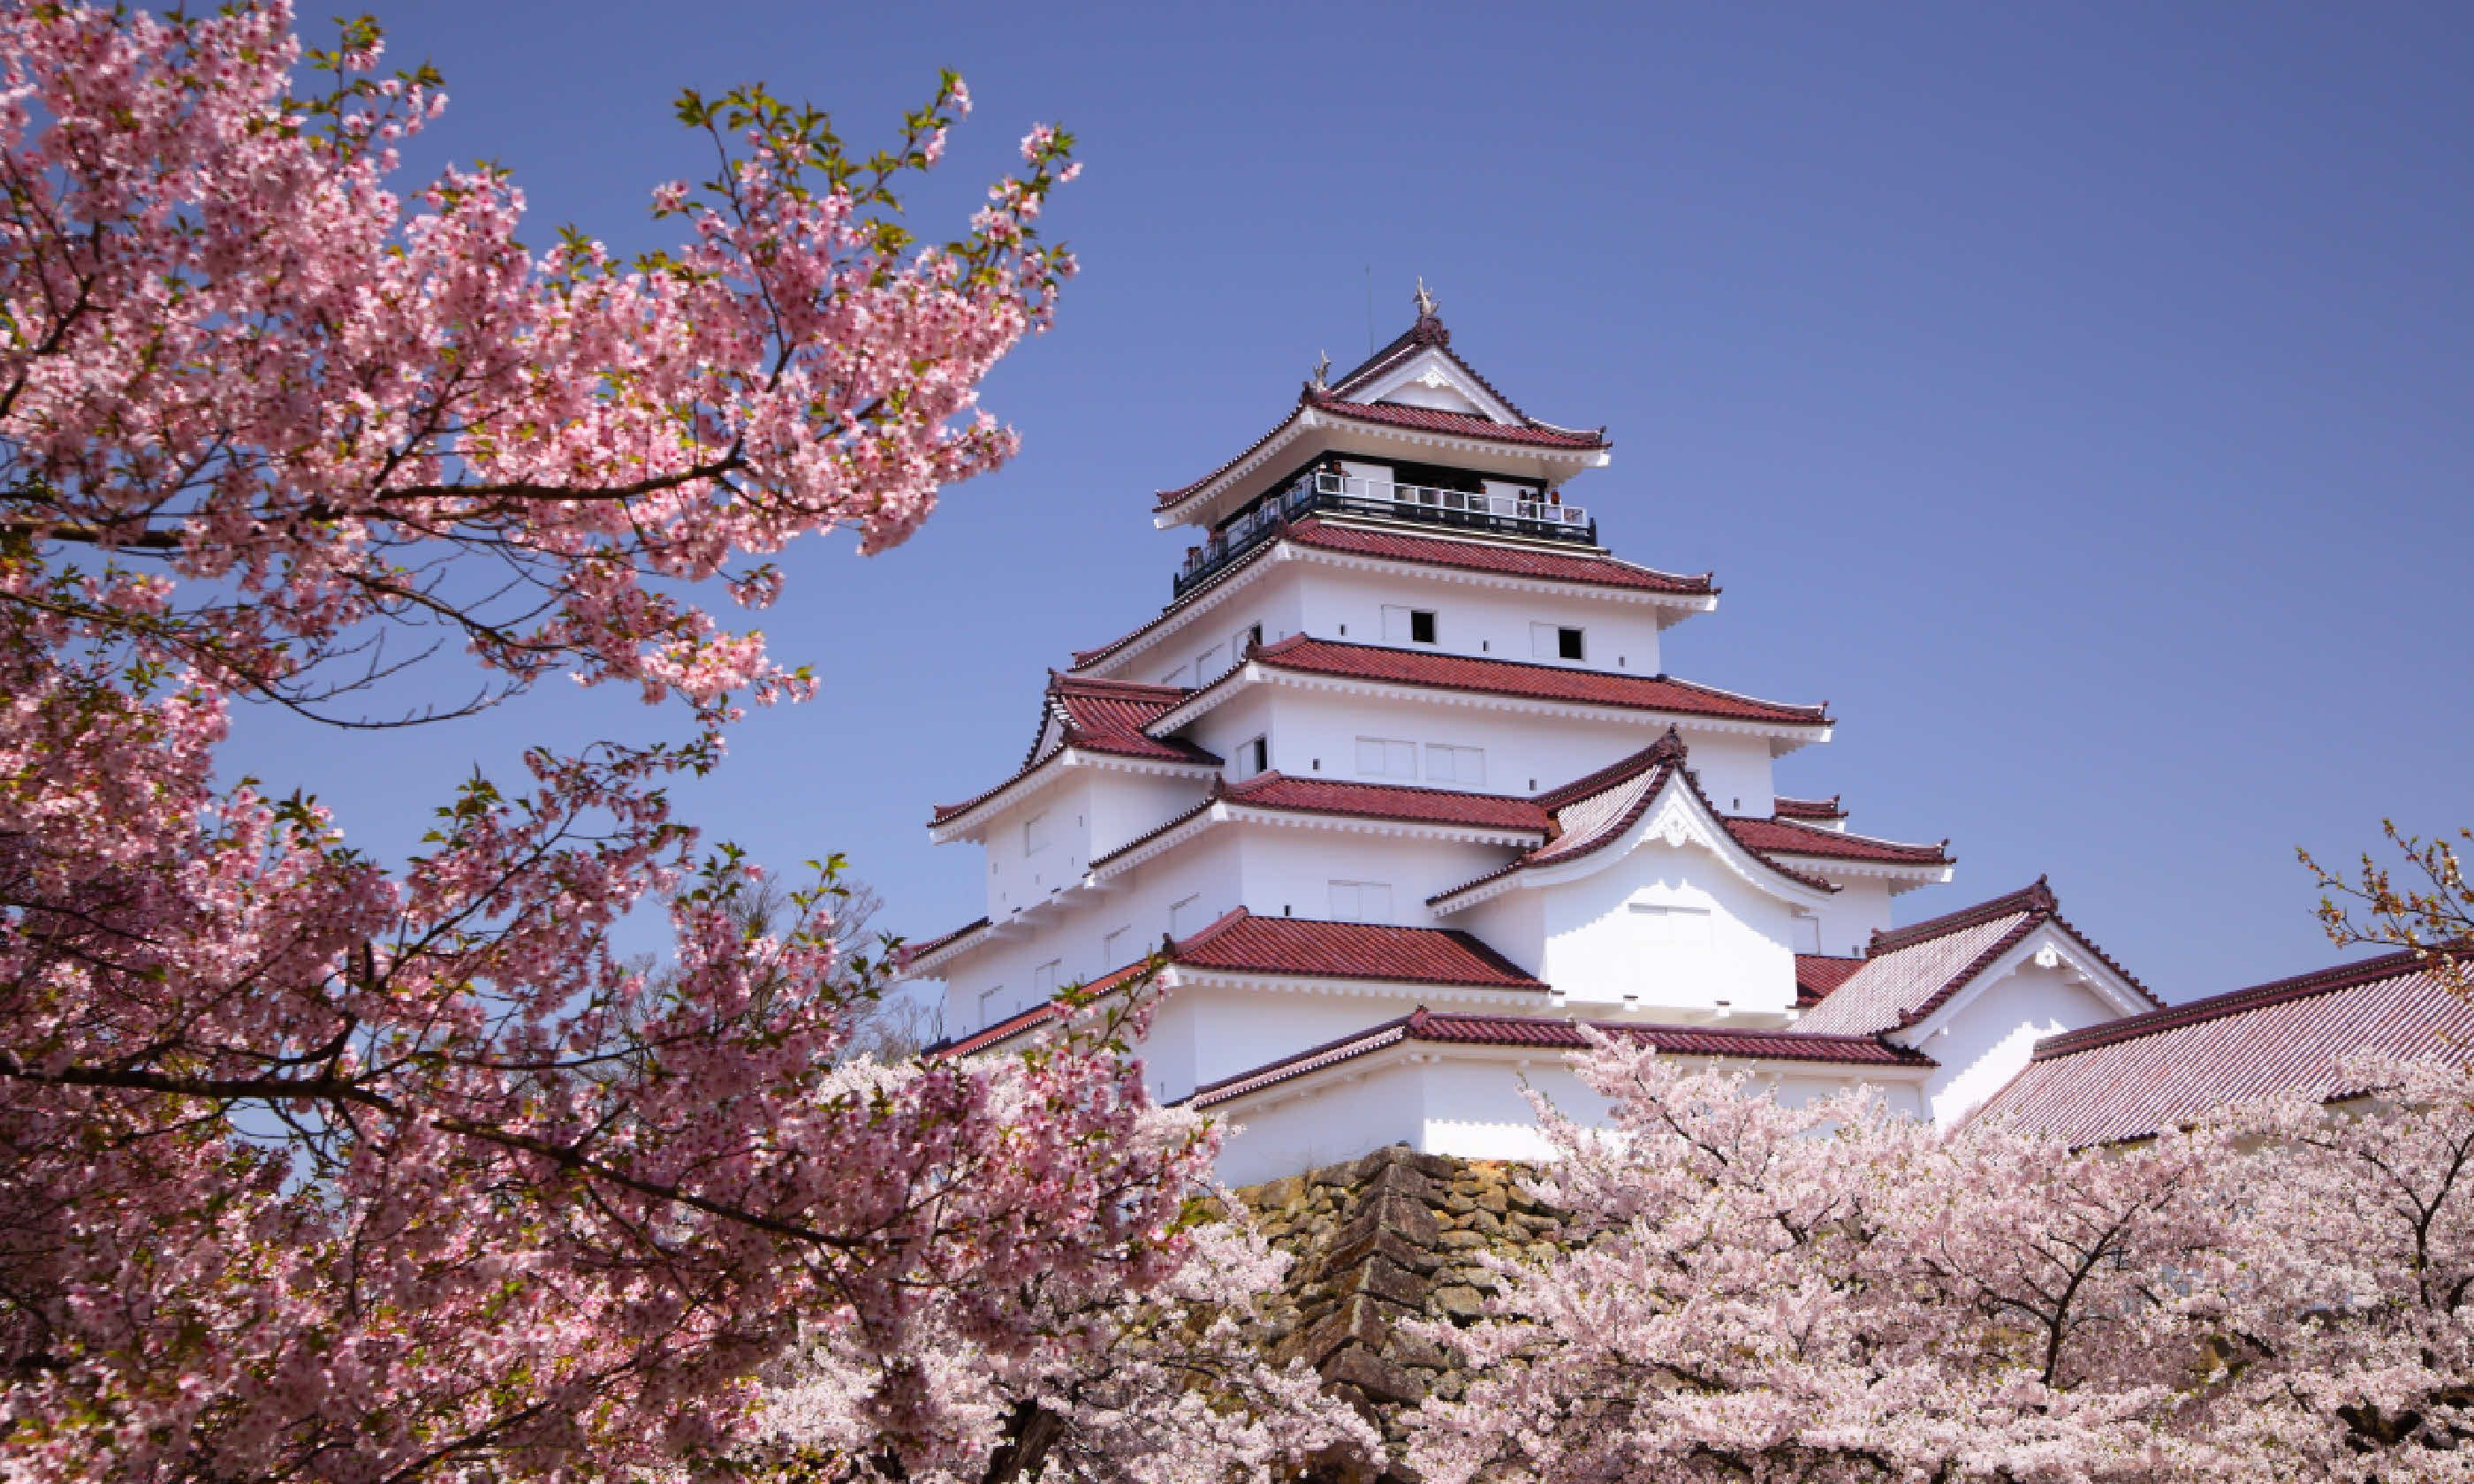 Cherry blossom in Fukushima, Japan (Shutterstock)